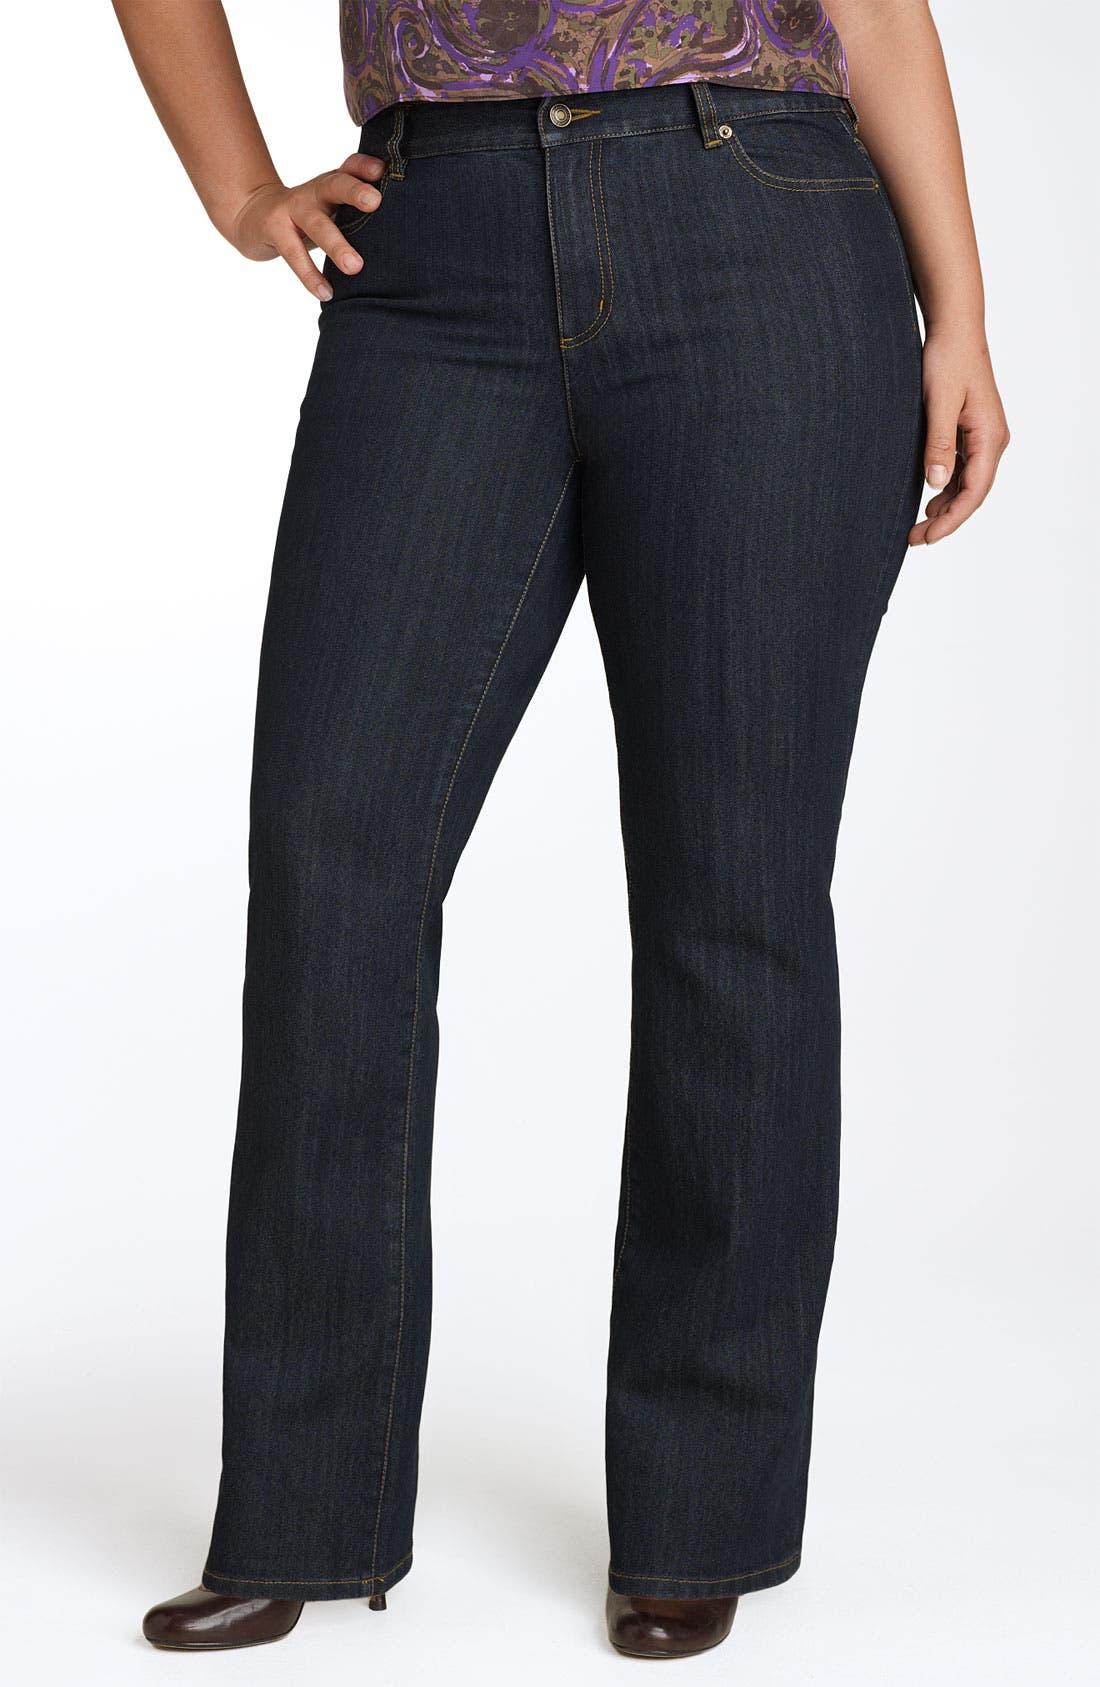 Main Image - MICHAEL Michael Kors 'Sausalito' Bootcut Jeans (Plus Size)